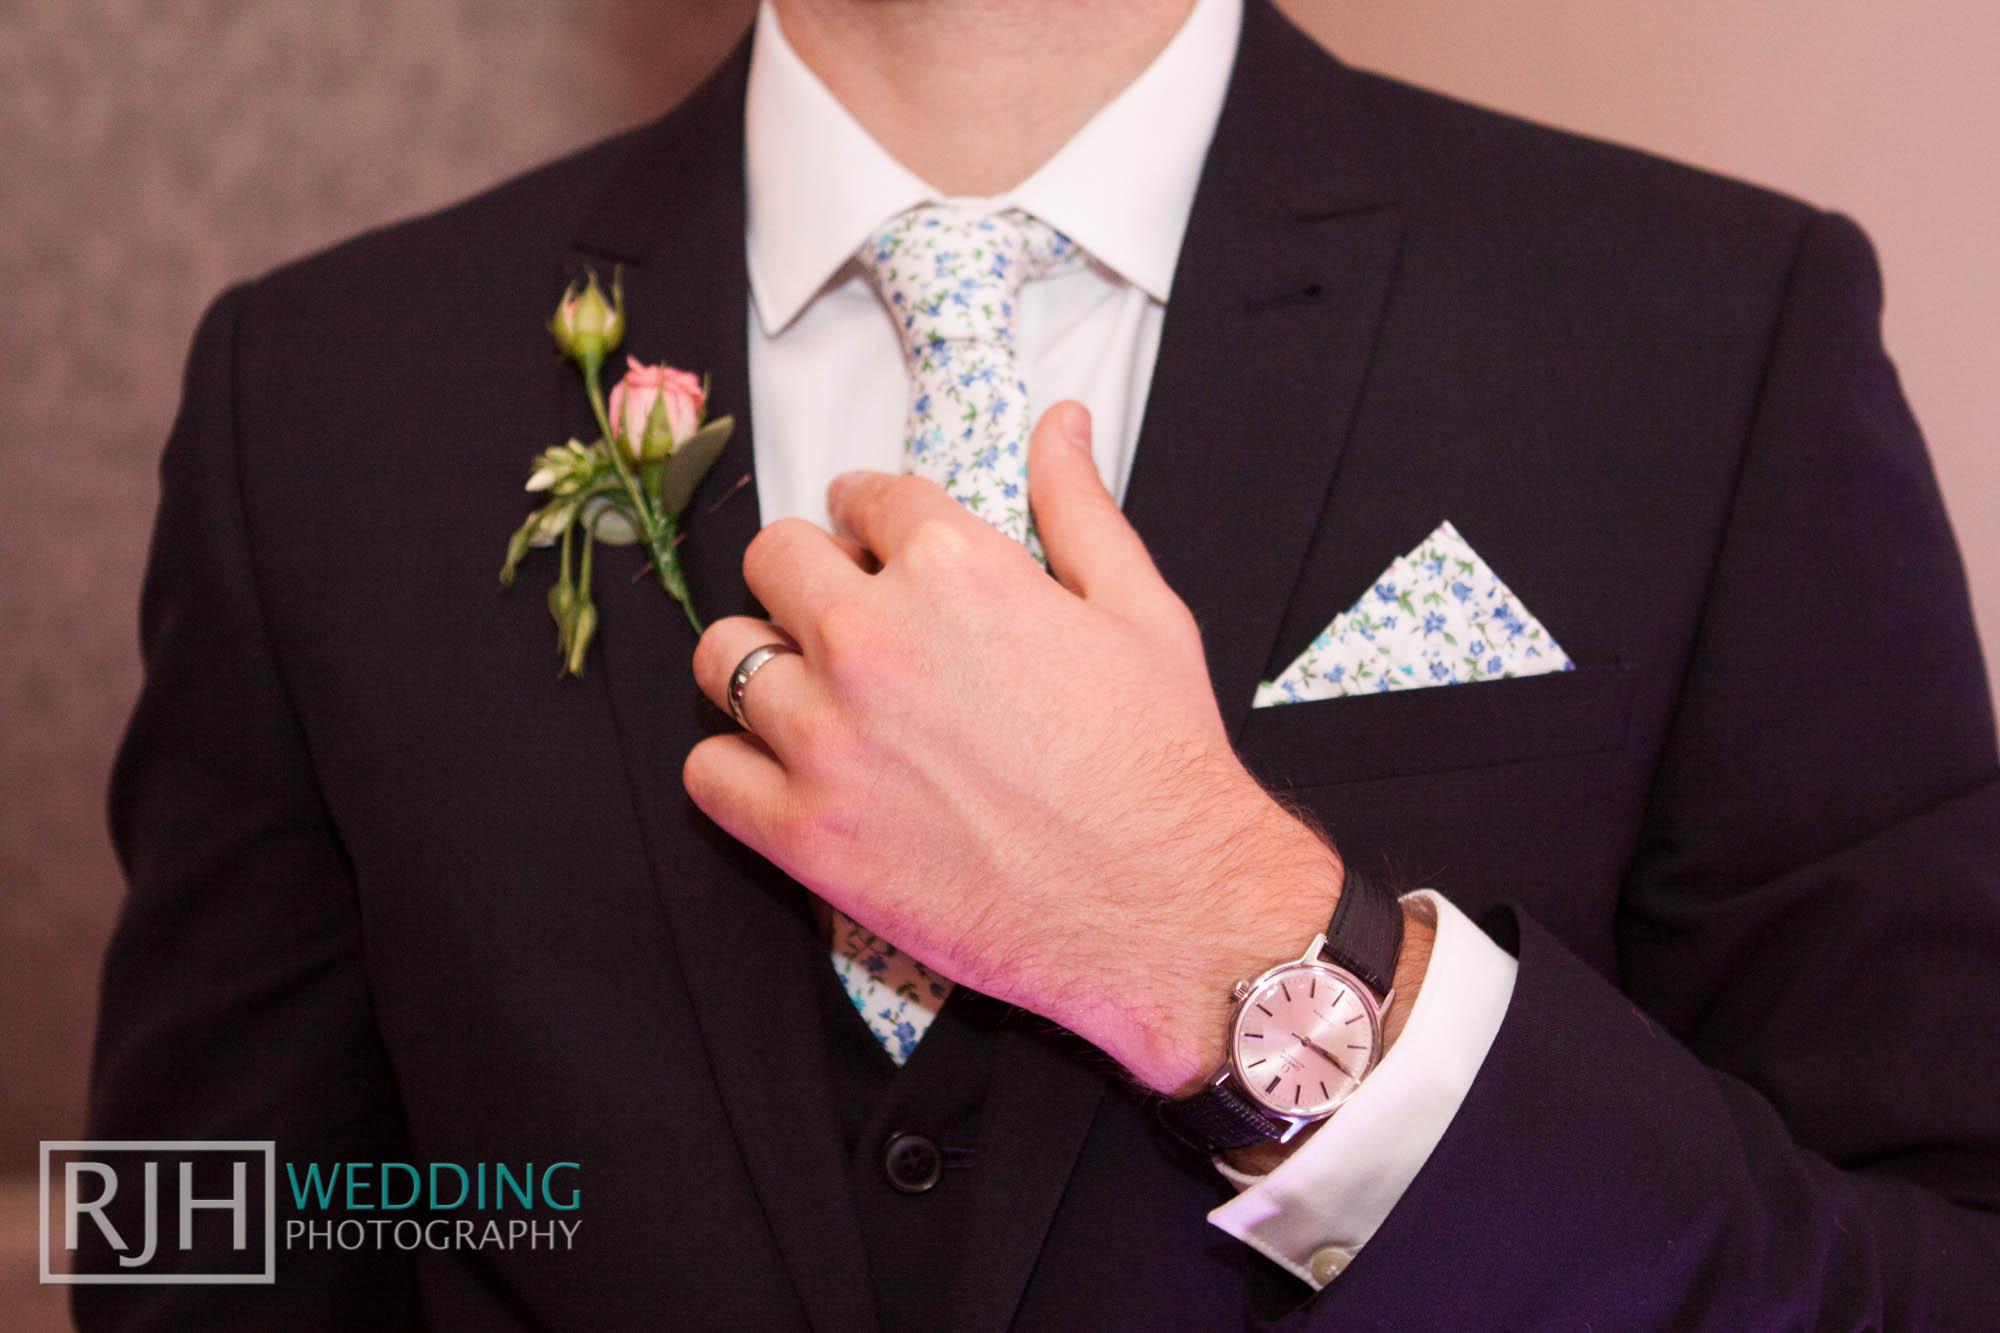 RJH Wedding Photography_2014 highlights_41.jpg